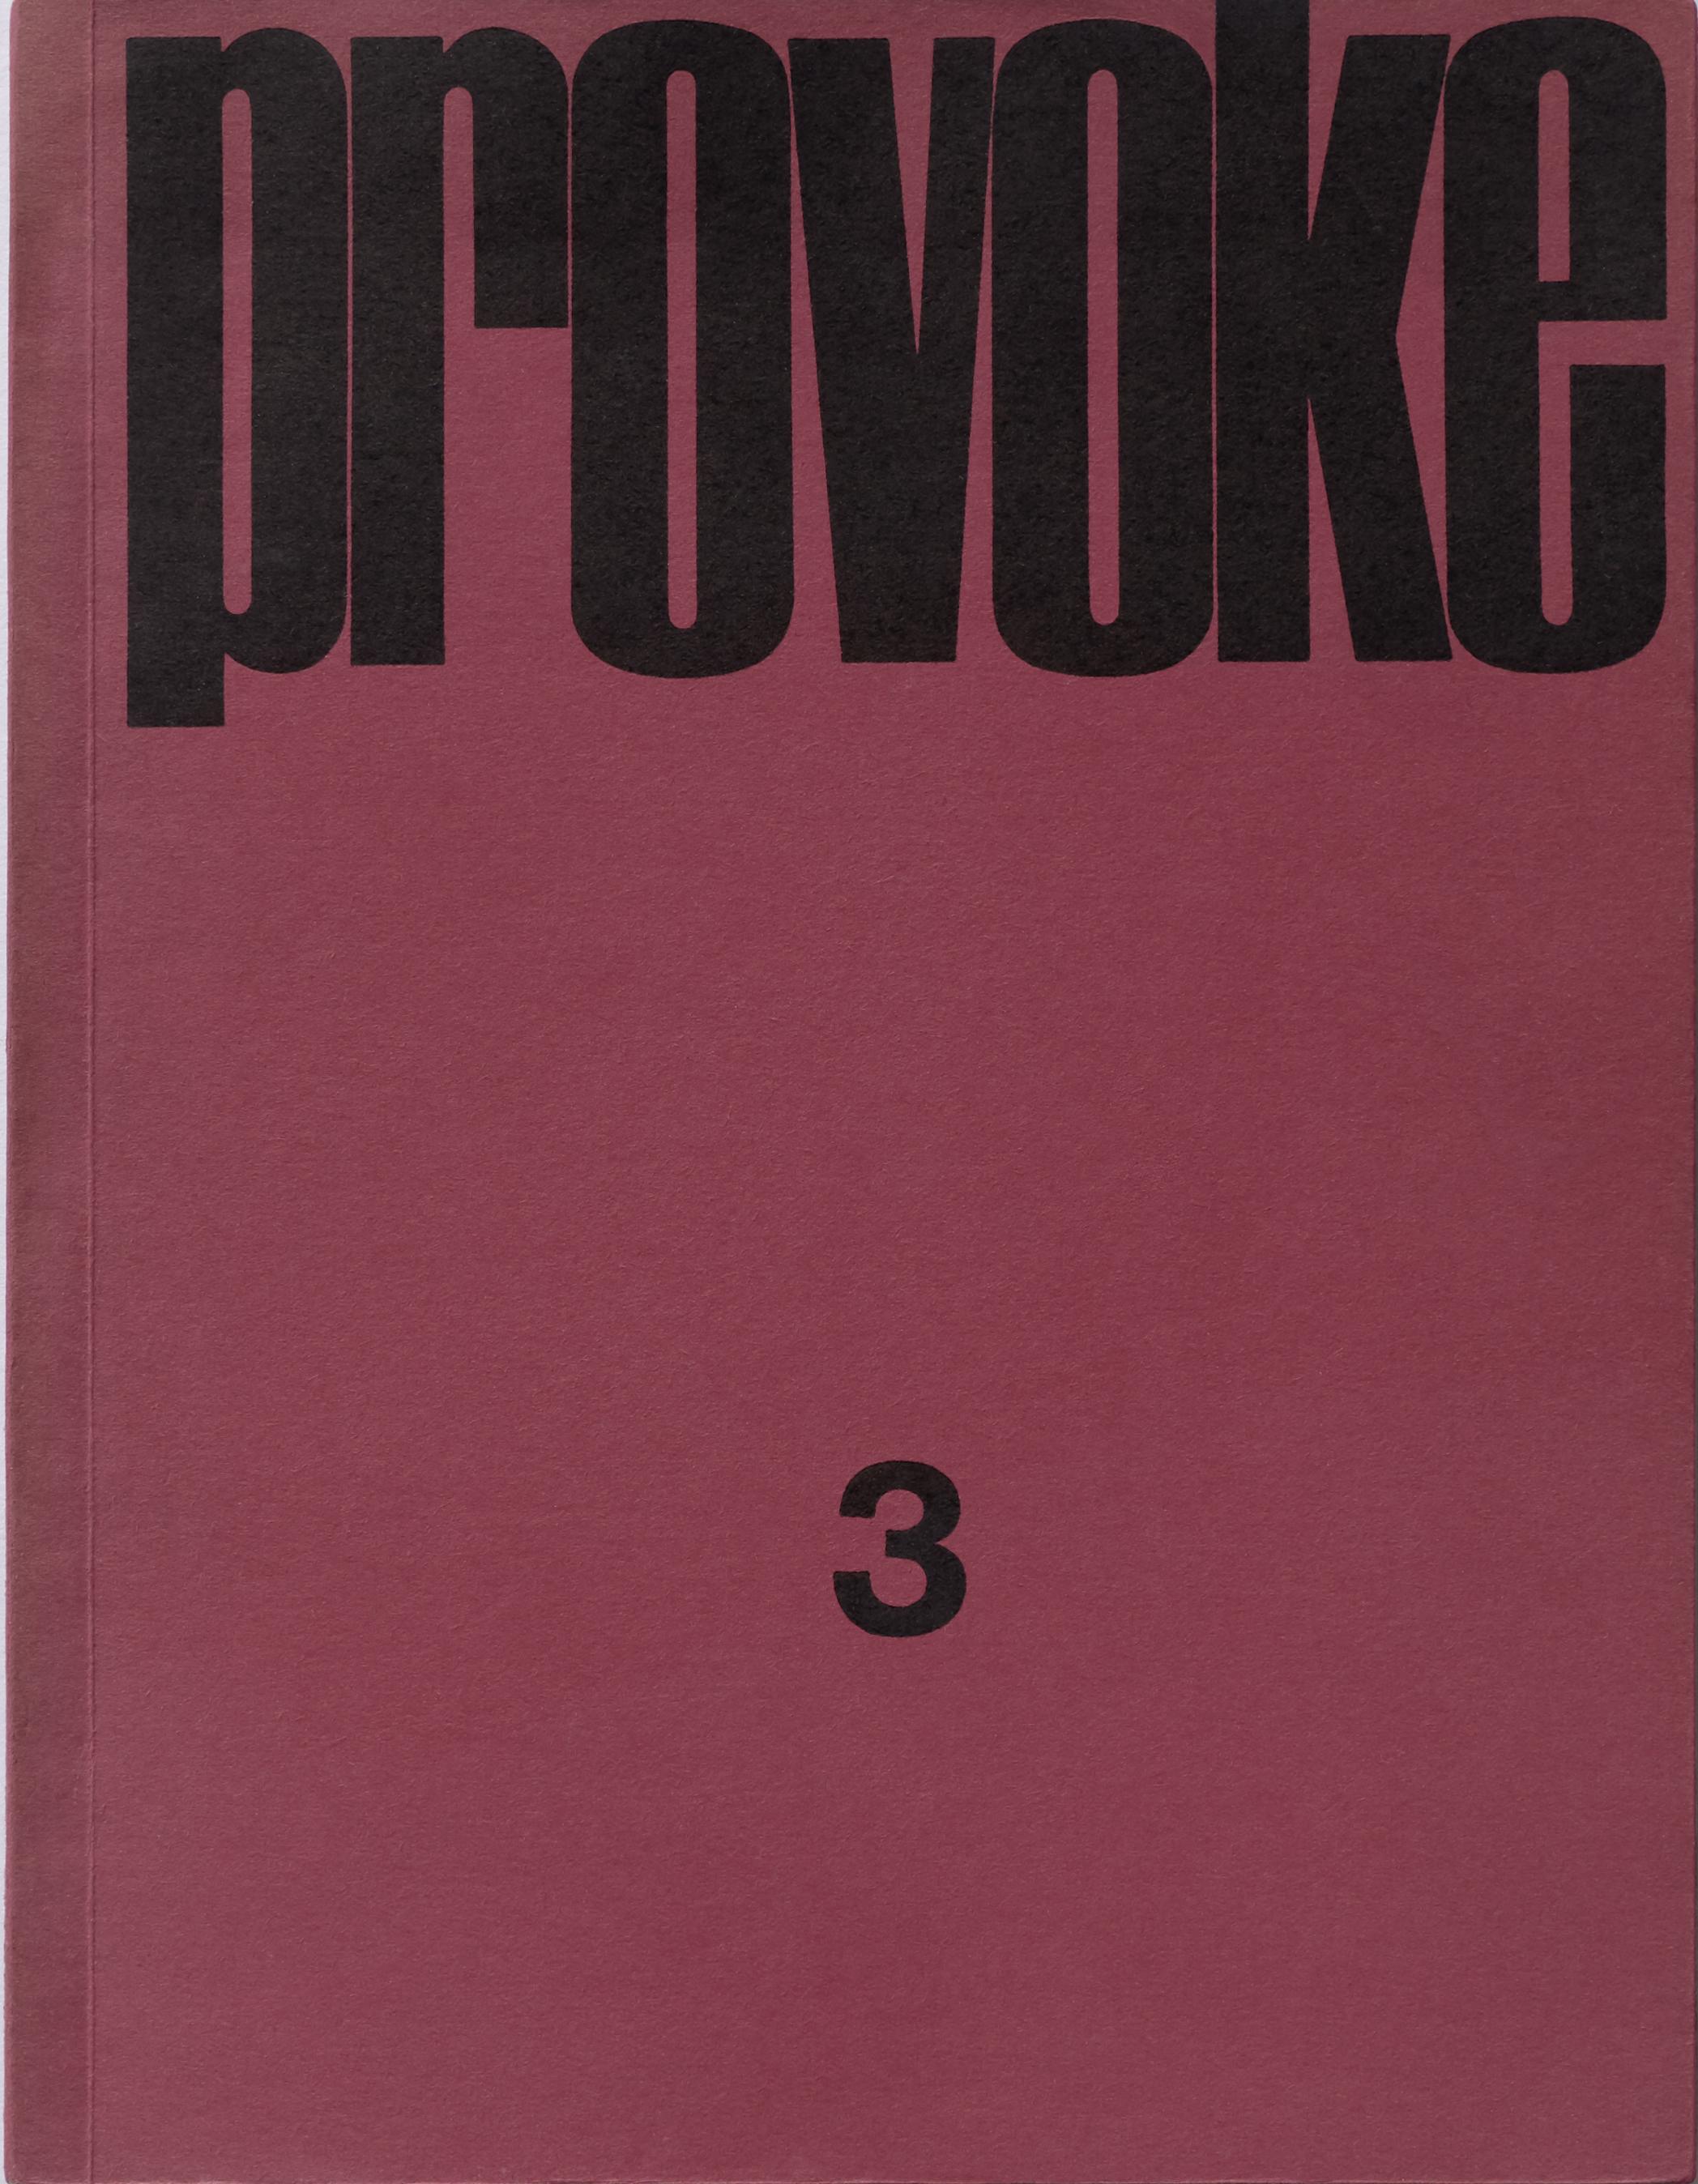 Daido Moriyama, Takuma Nakahira, Okada Takahiko, Yukata Takanashi, Kōji Taki Provoke 3, cover, 1969 © Nakahira Gen/ Moriyama Daido/ Takahiko Okada /Takanashi Yukata/Taki Koji